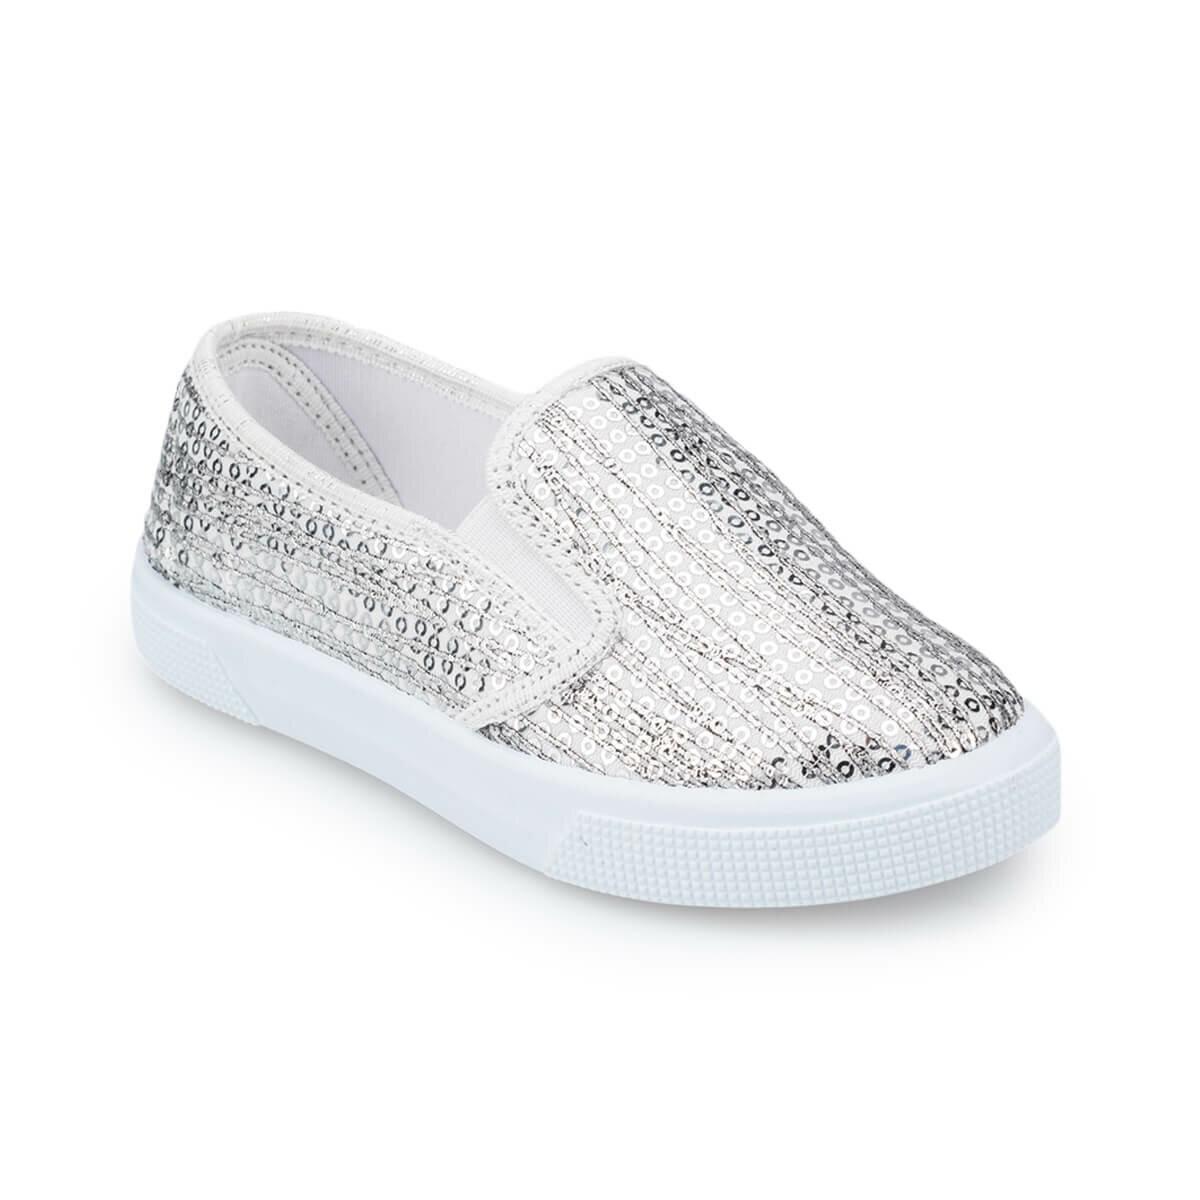 FLO 91.511433.F Gray Female Child Shoes Polaris